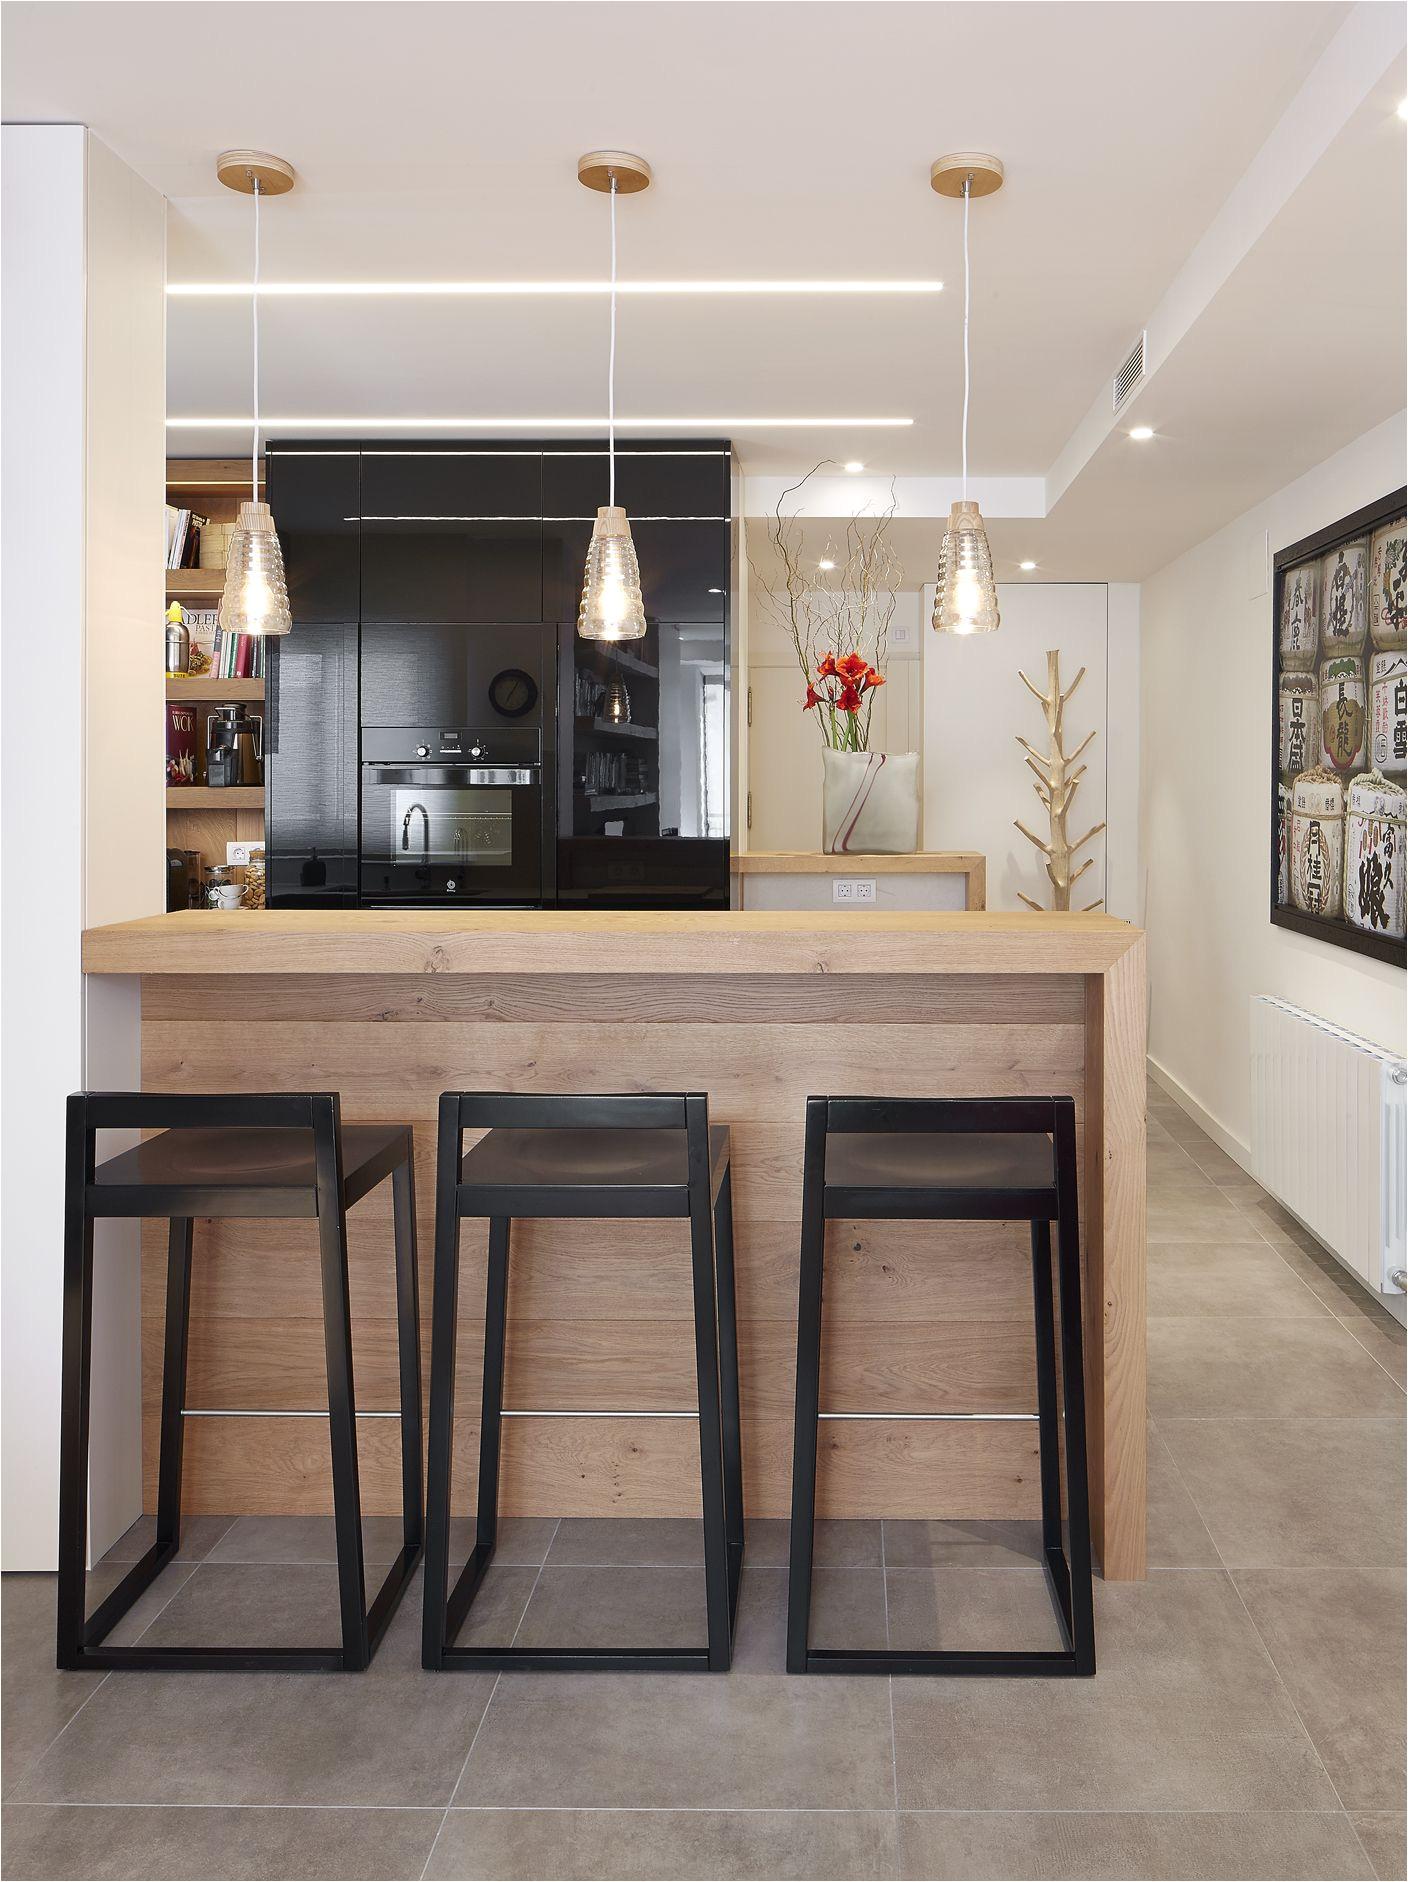 molins interiors arquitectura interior interiorismo decoracia n cocina loft barra negra negro porcelanico encimera deckton taburetes